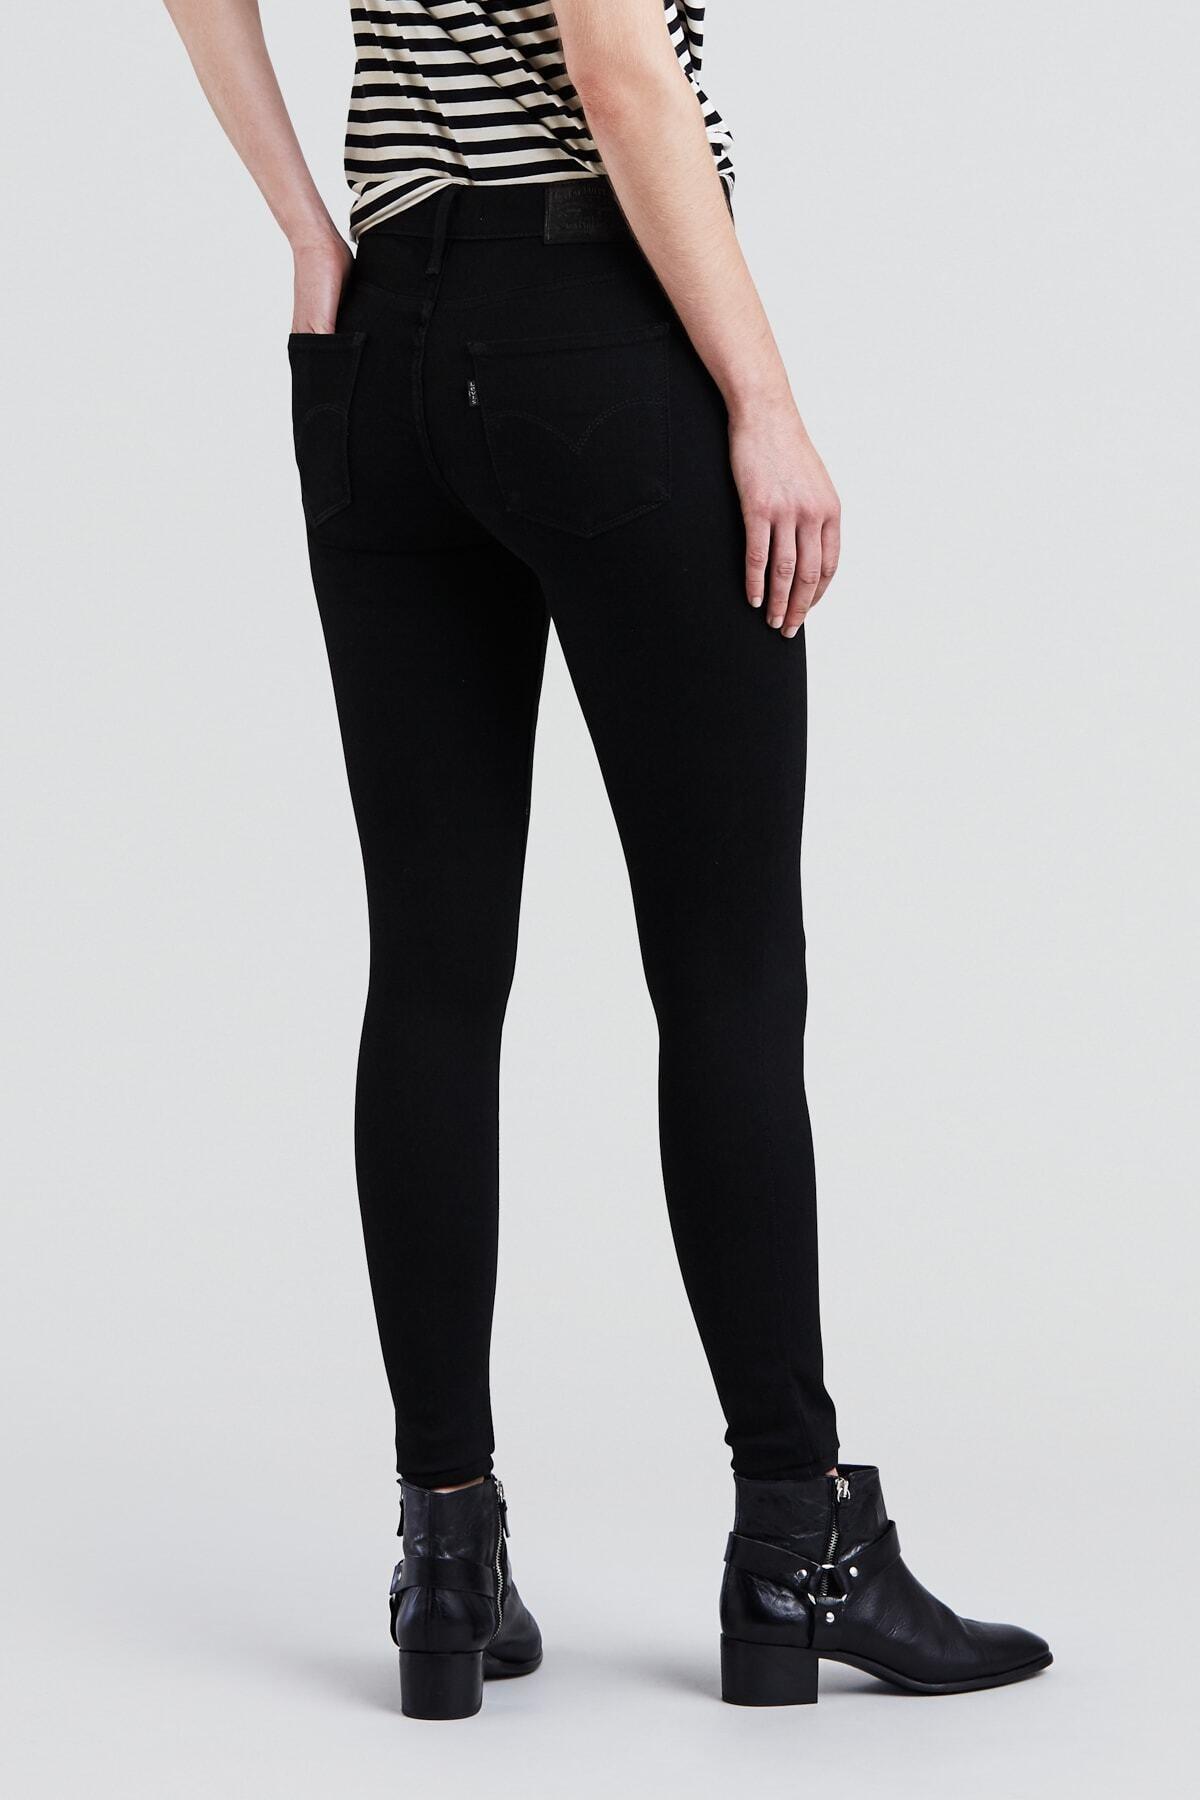 Levi's Kadın Jean Pantolon 720 High Rise Super Skinny 52797-0000 2